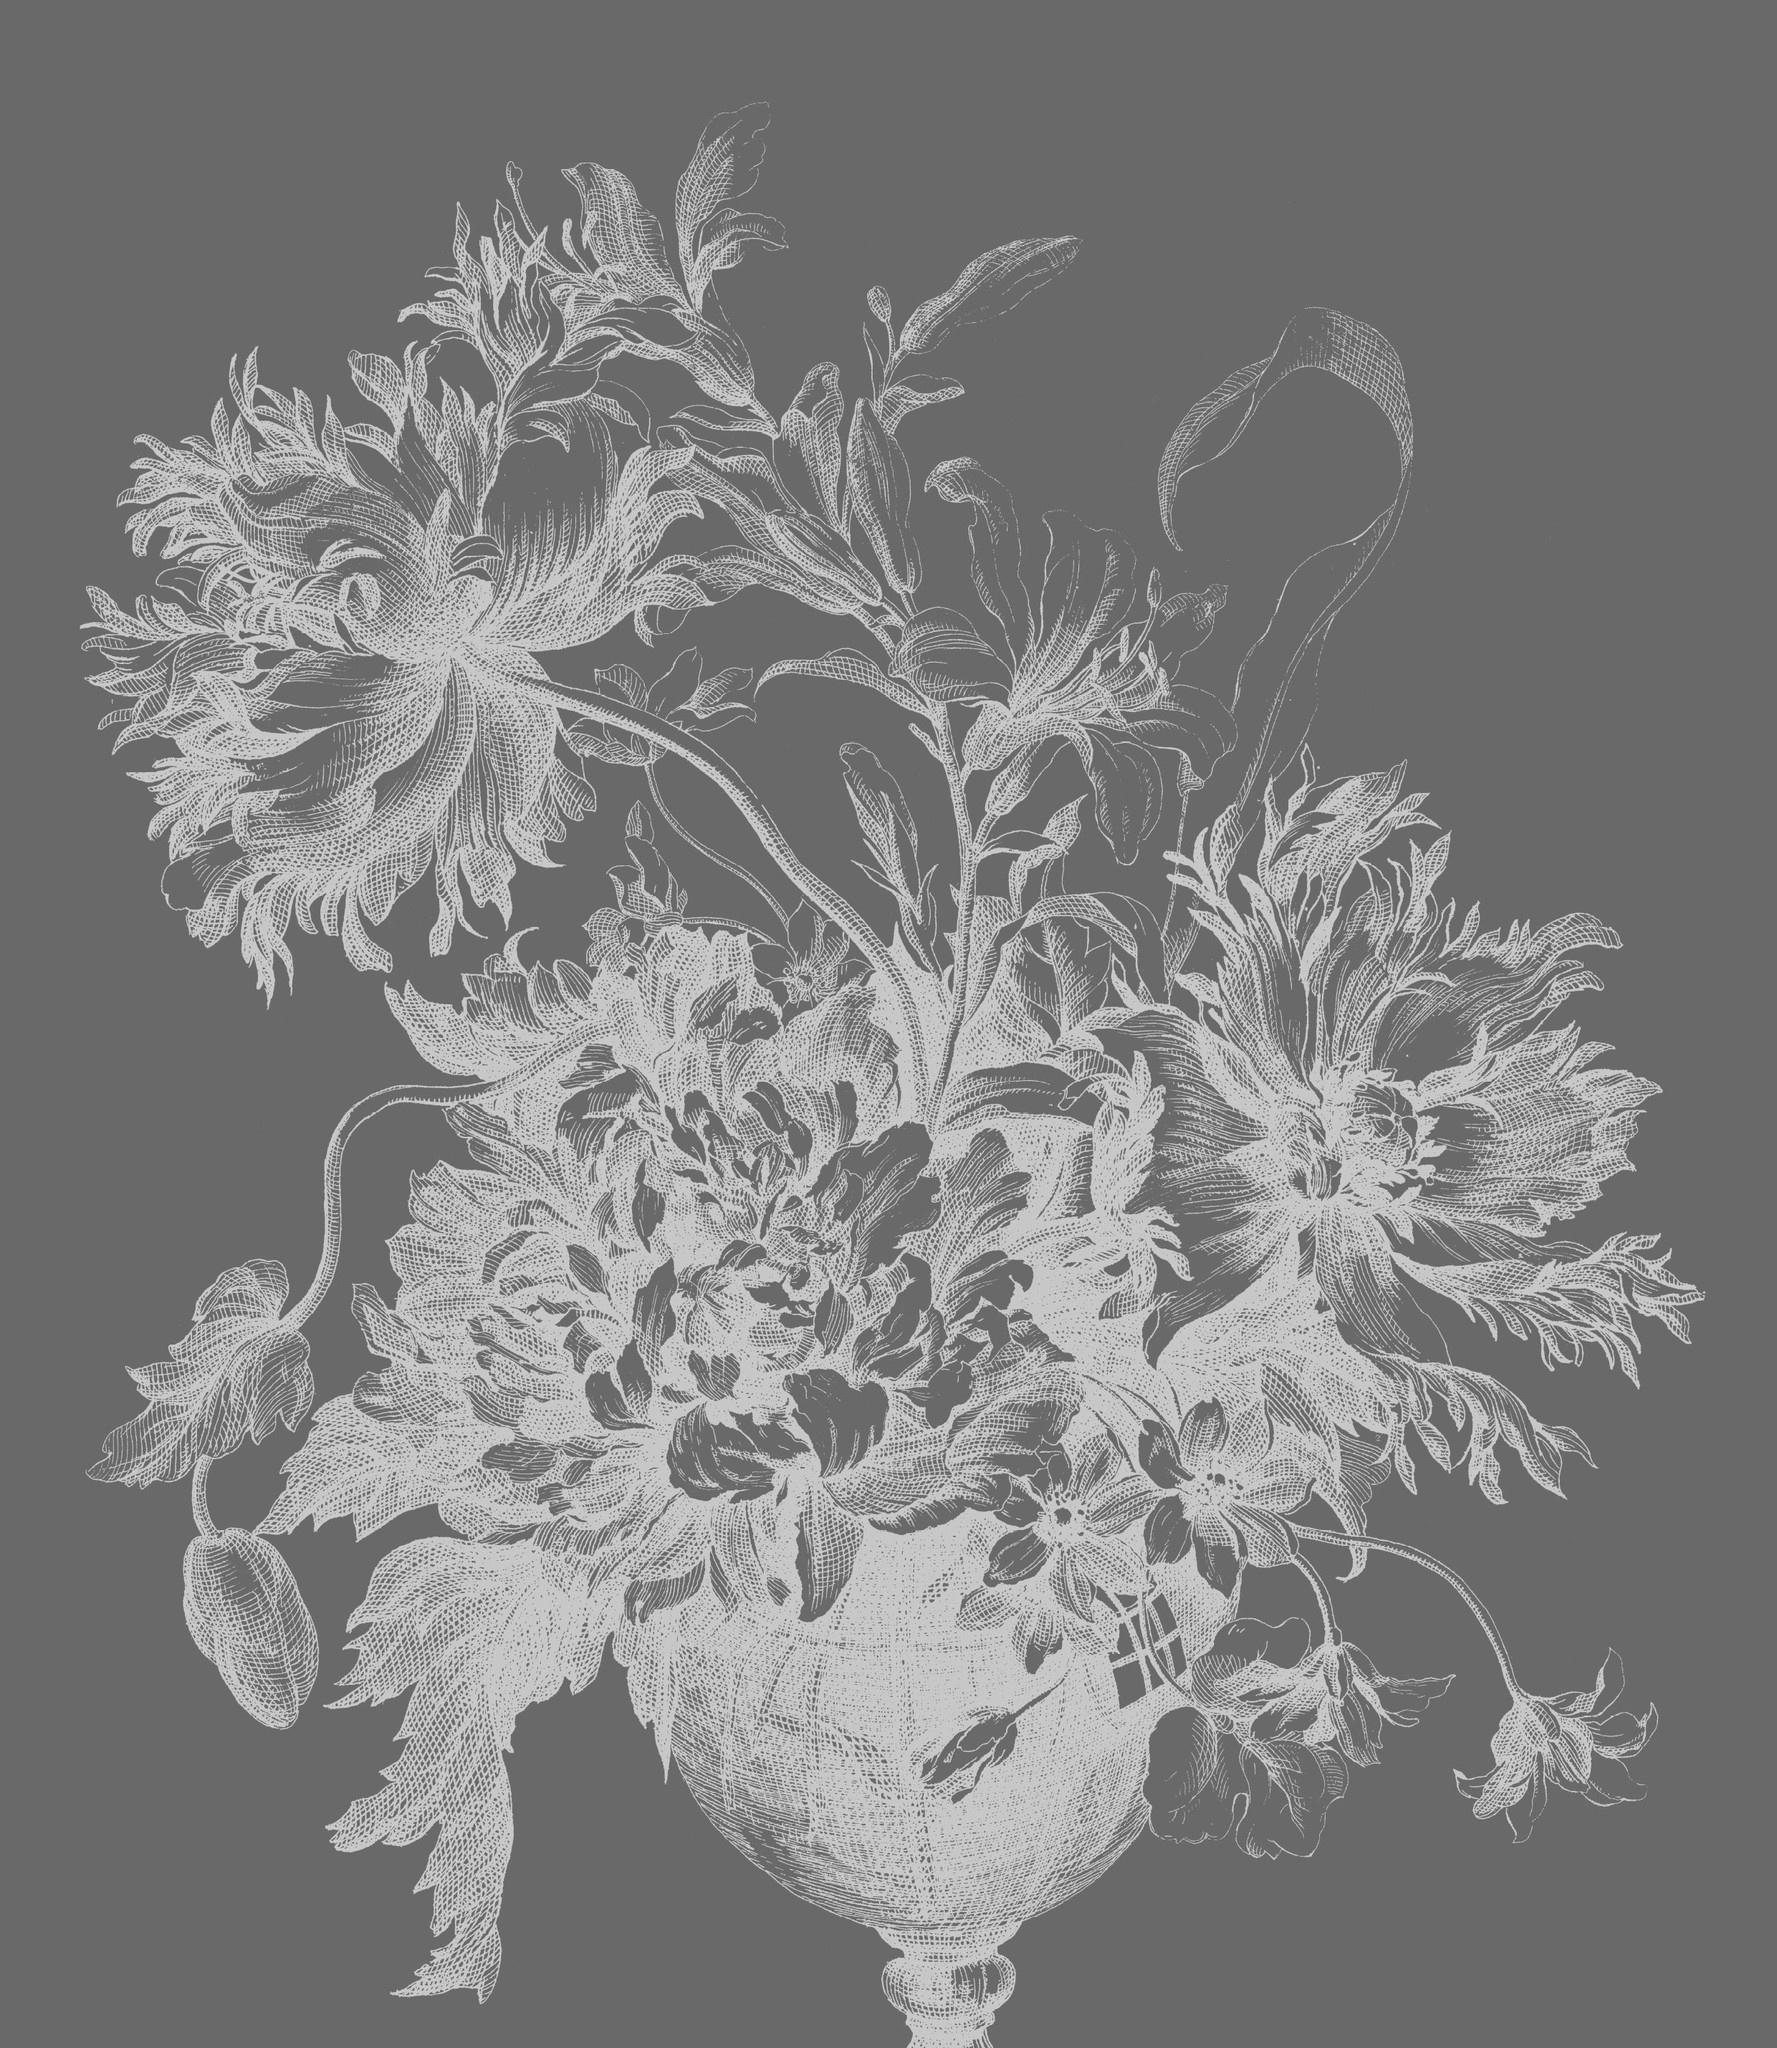 Behang Engraved Flowers XL 190x220cm-1